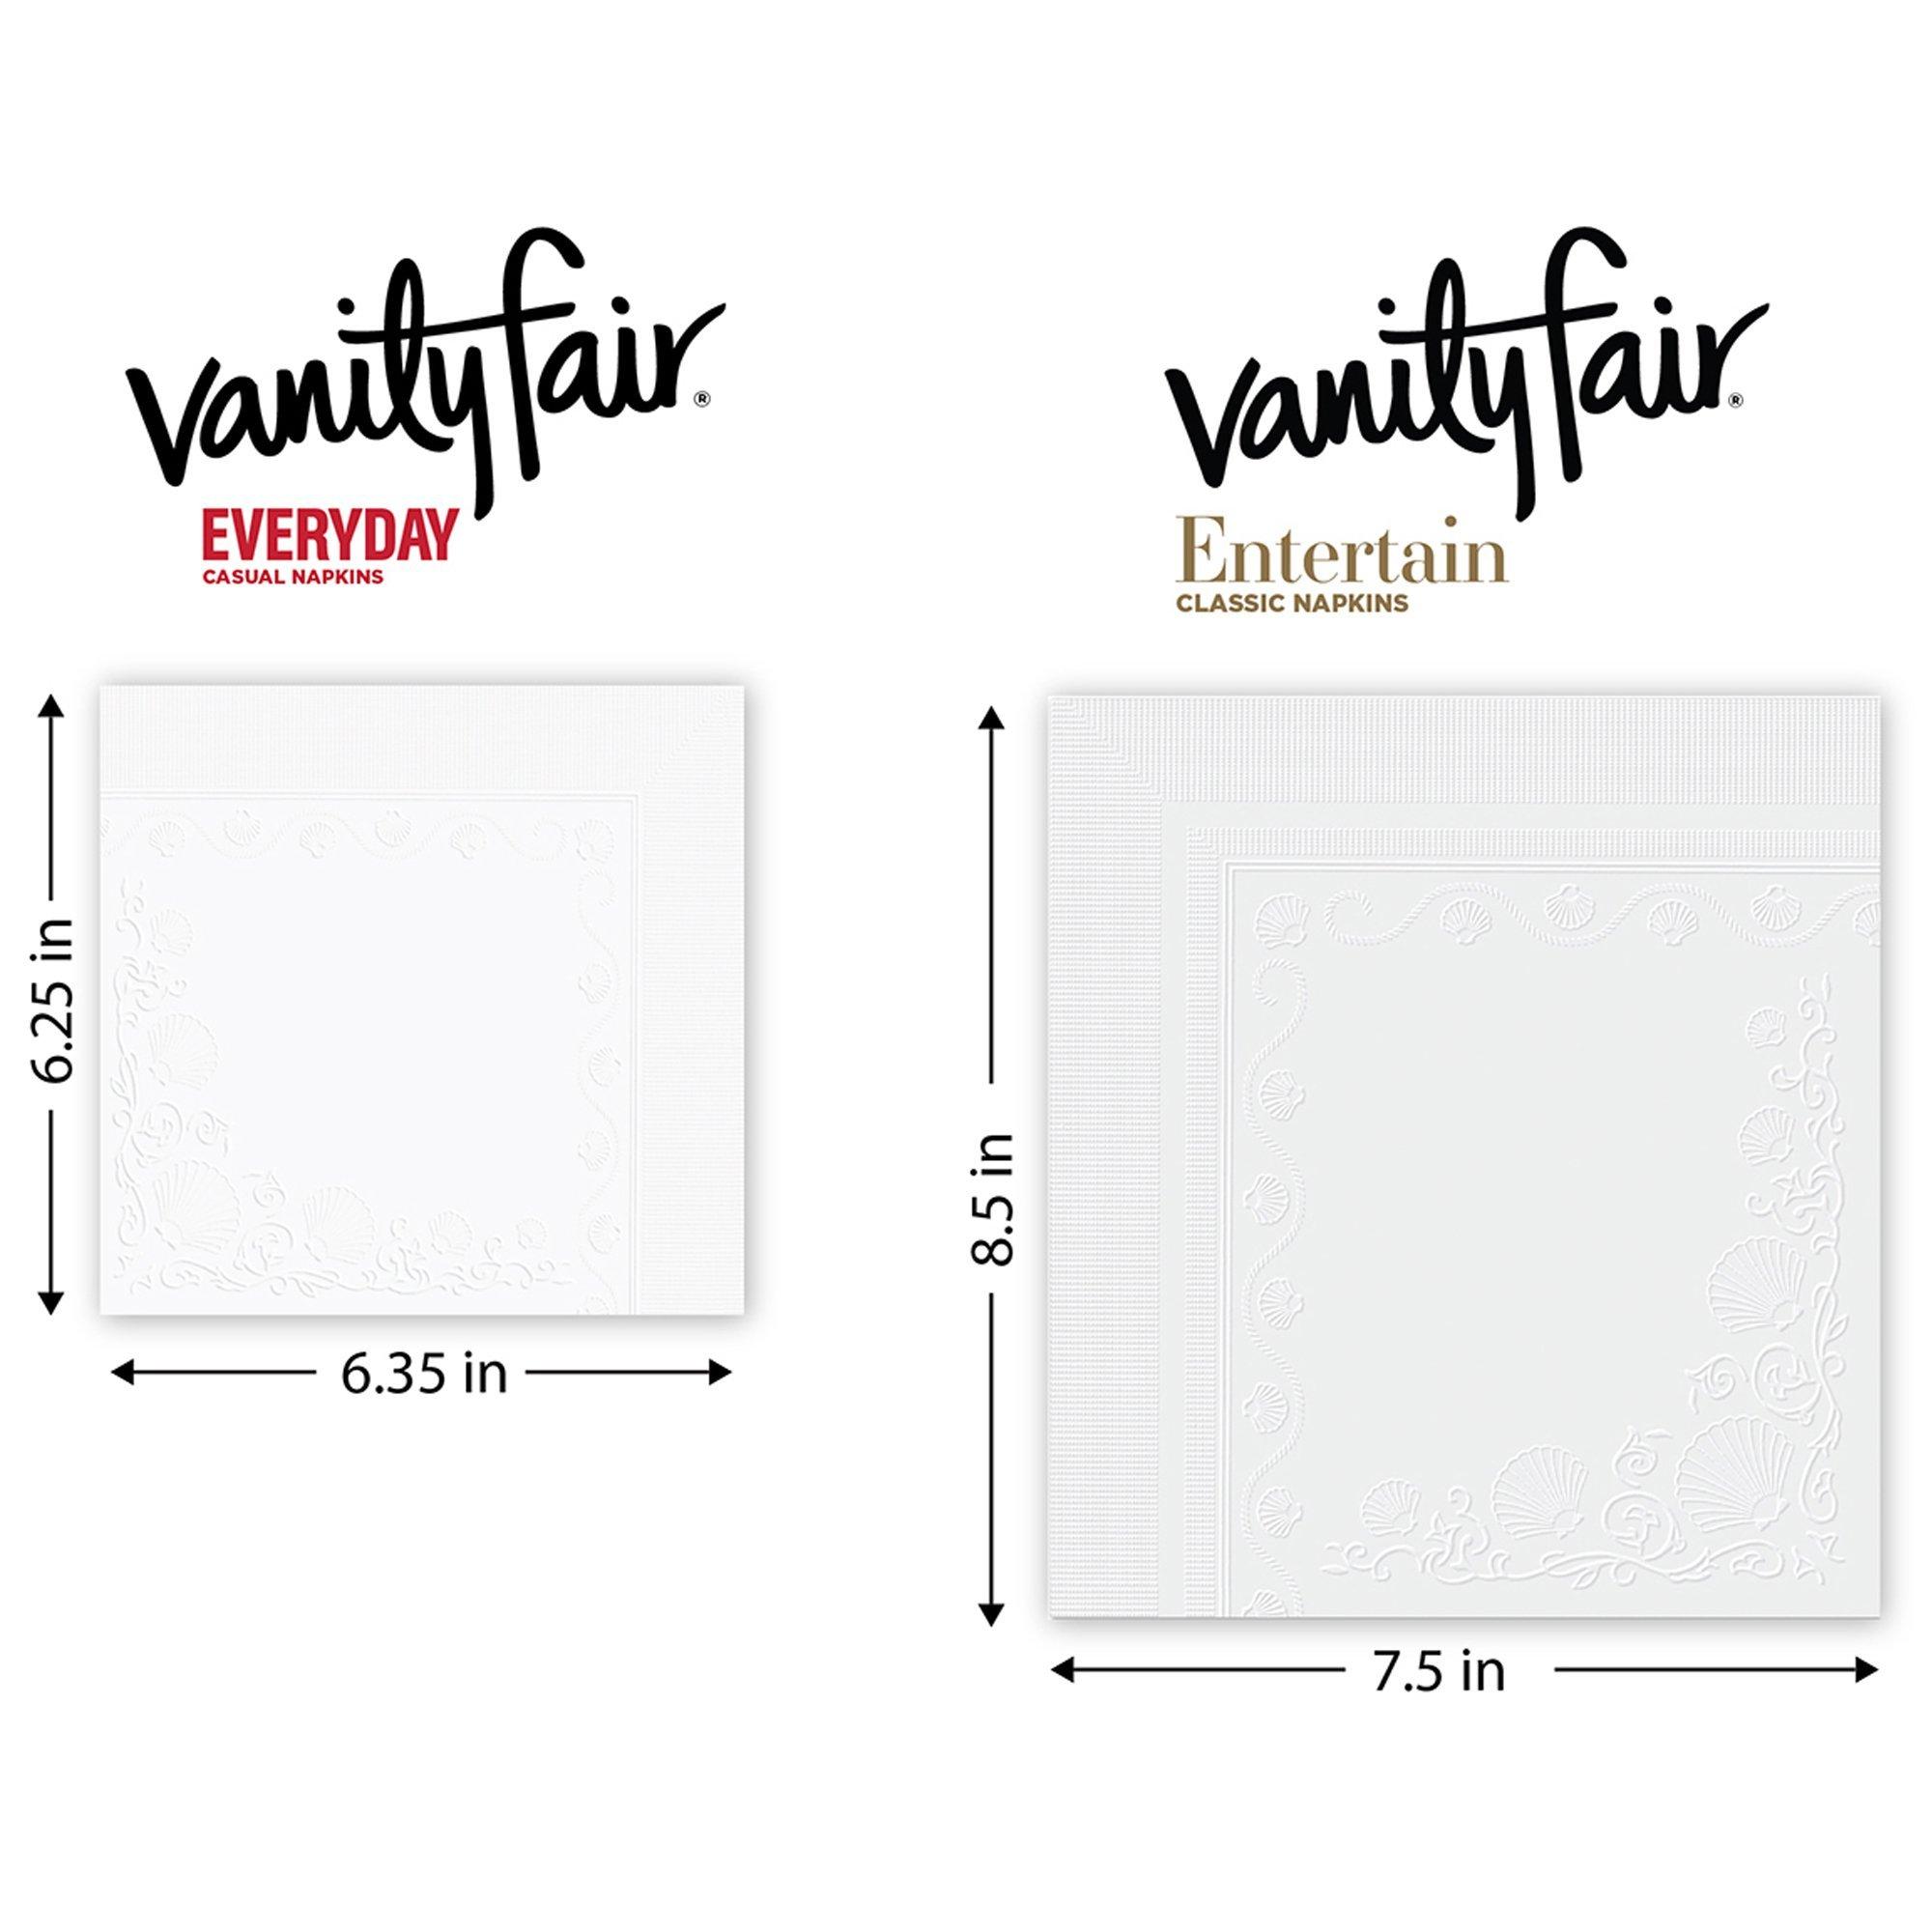 Vanity Fair Everyday Napkins, 1080 Count, White Paper Napkins, 12 Packs of 90 Napkins by Vanity Fair (Image #6)